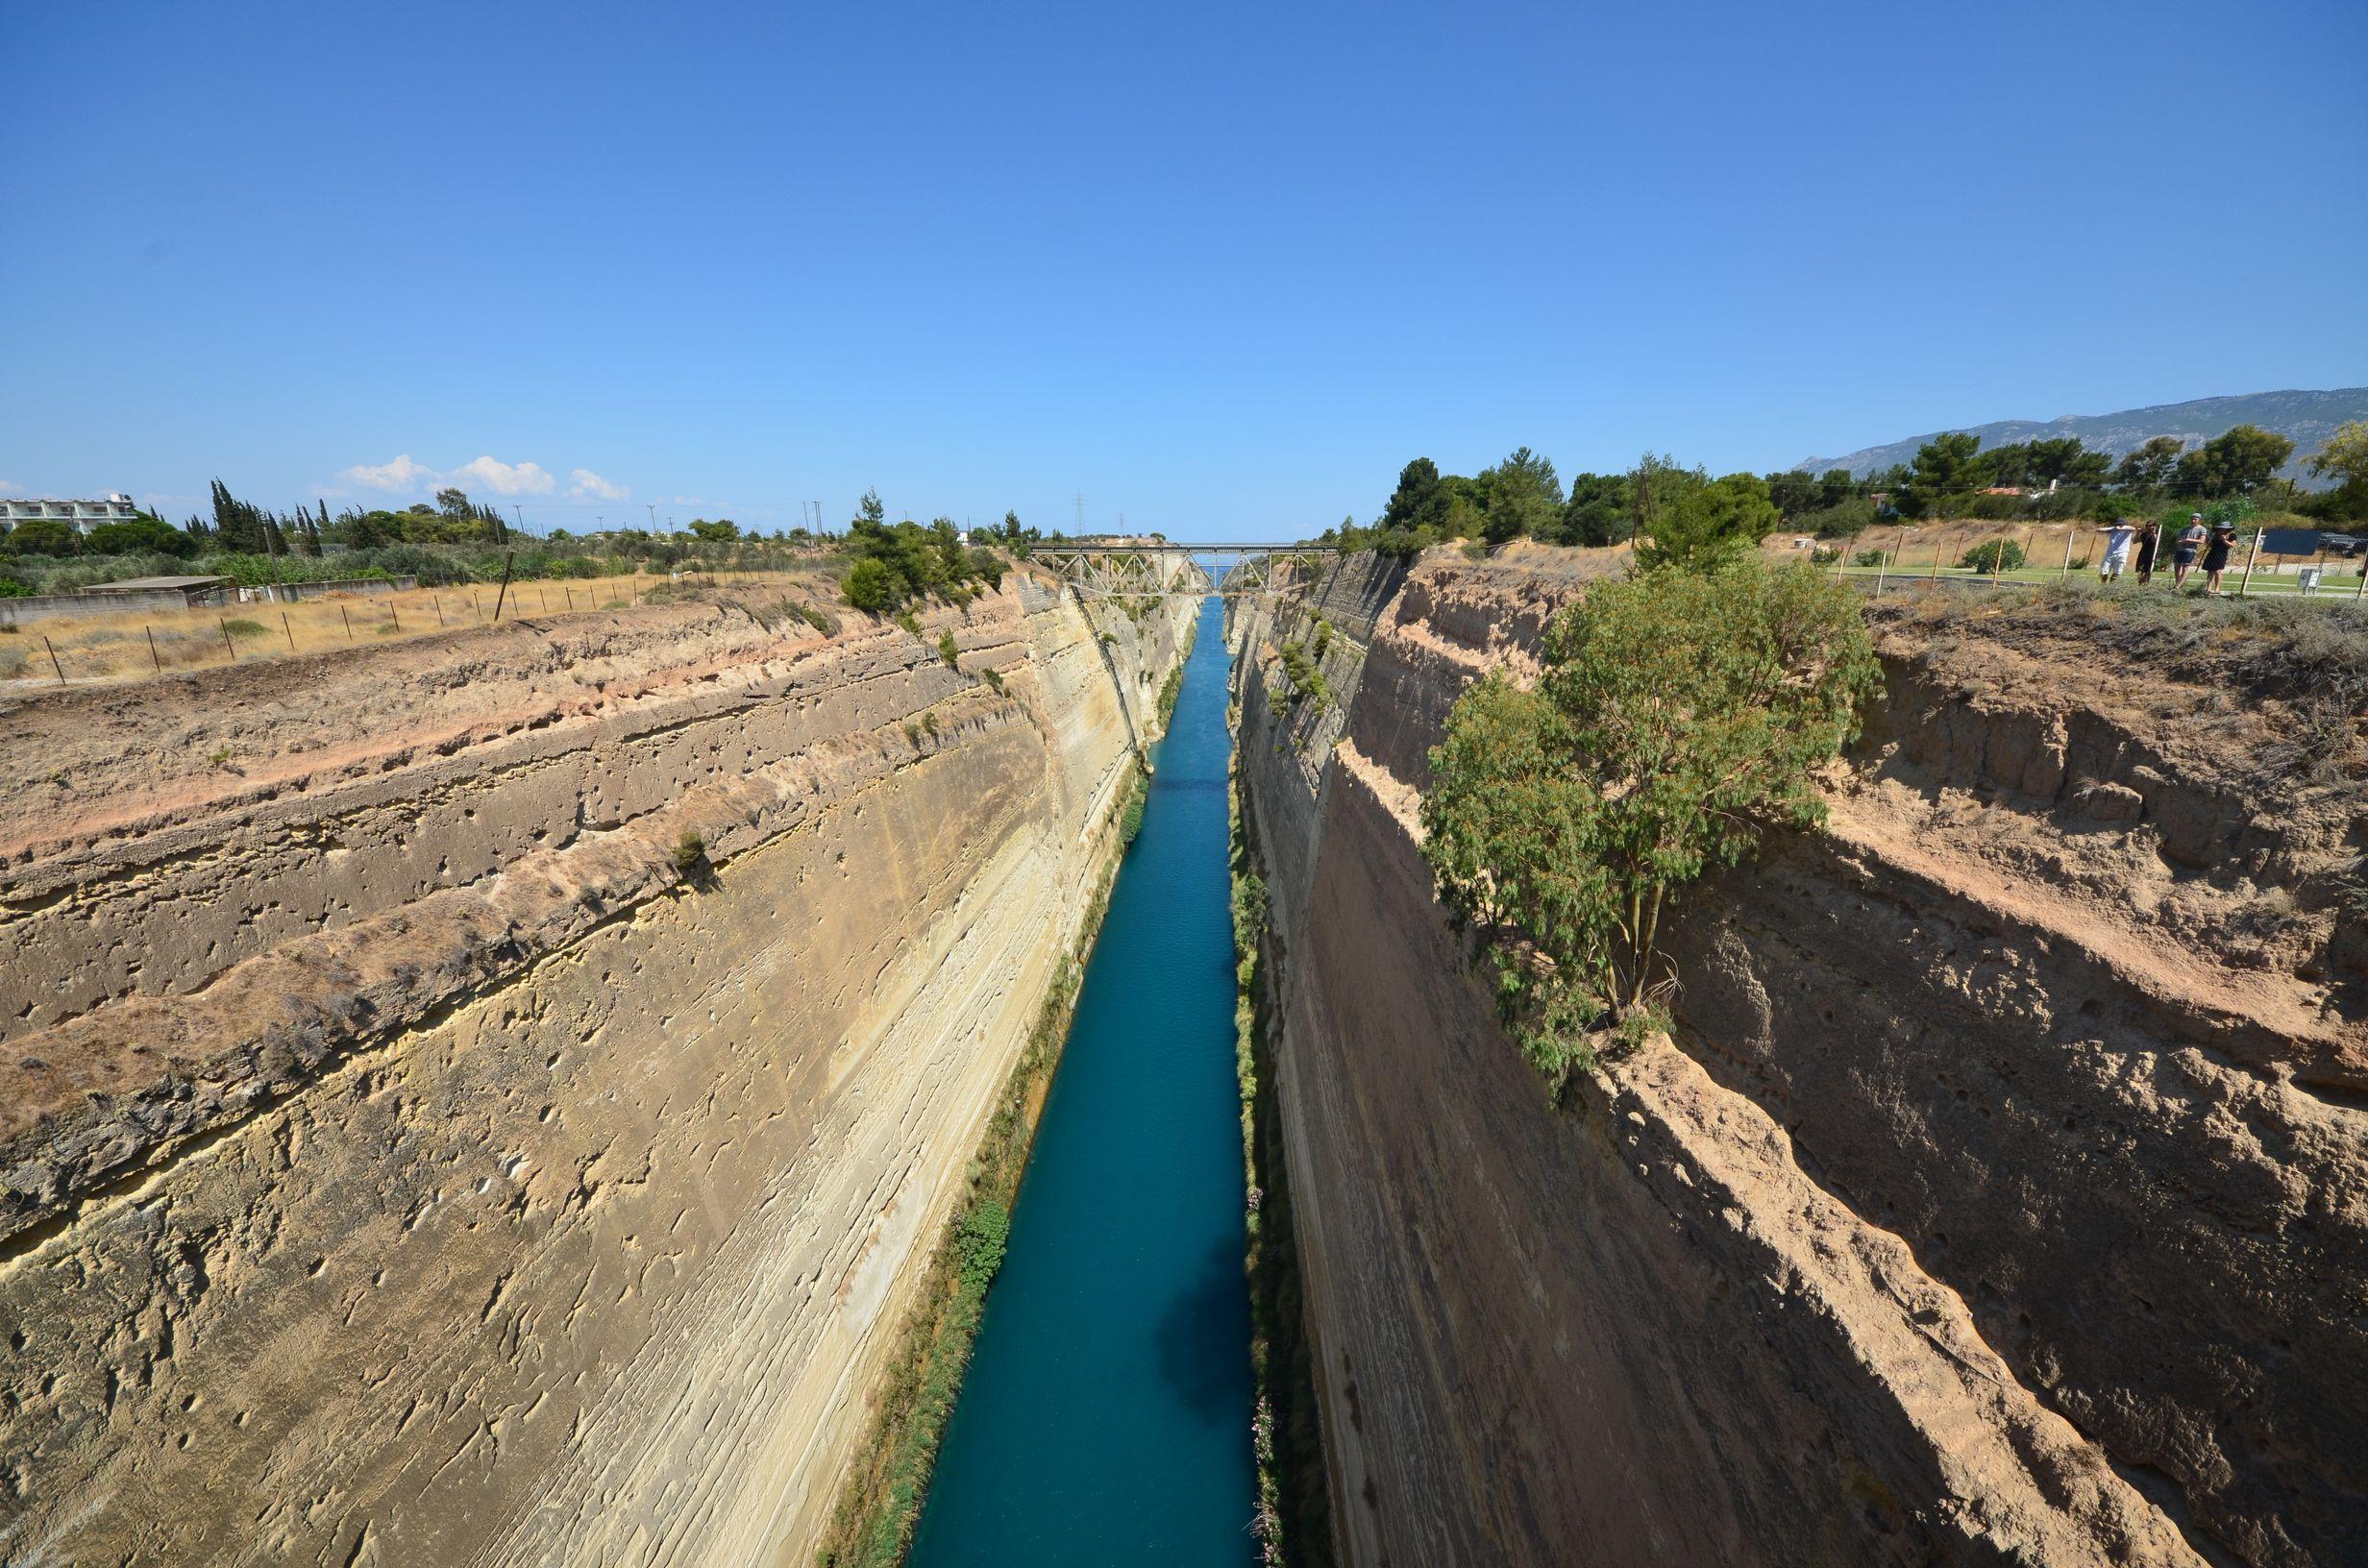 Tour d'Europe, Grèce, canal de corinthe